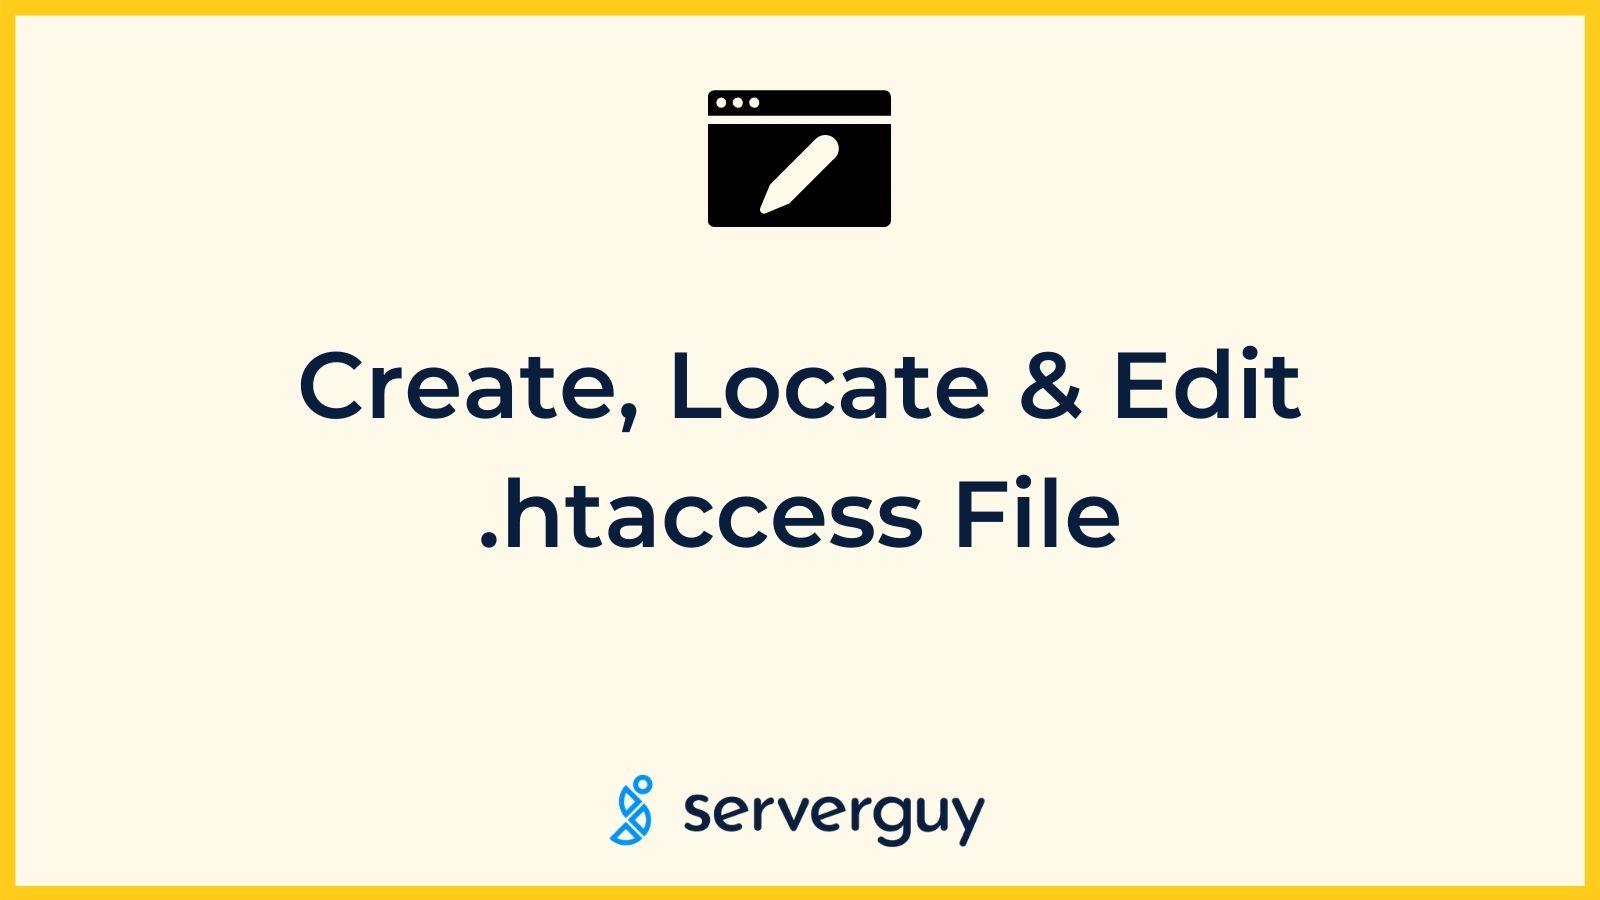 Create Locate and Edit htaccess File